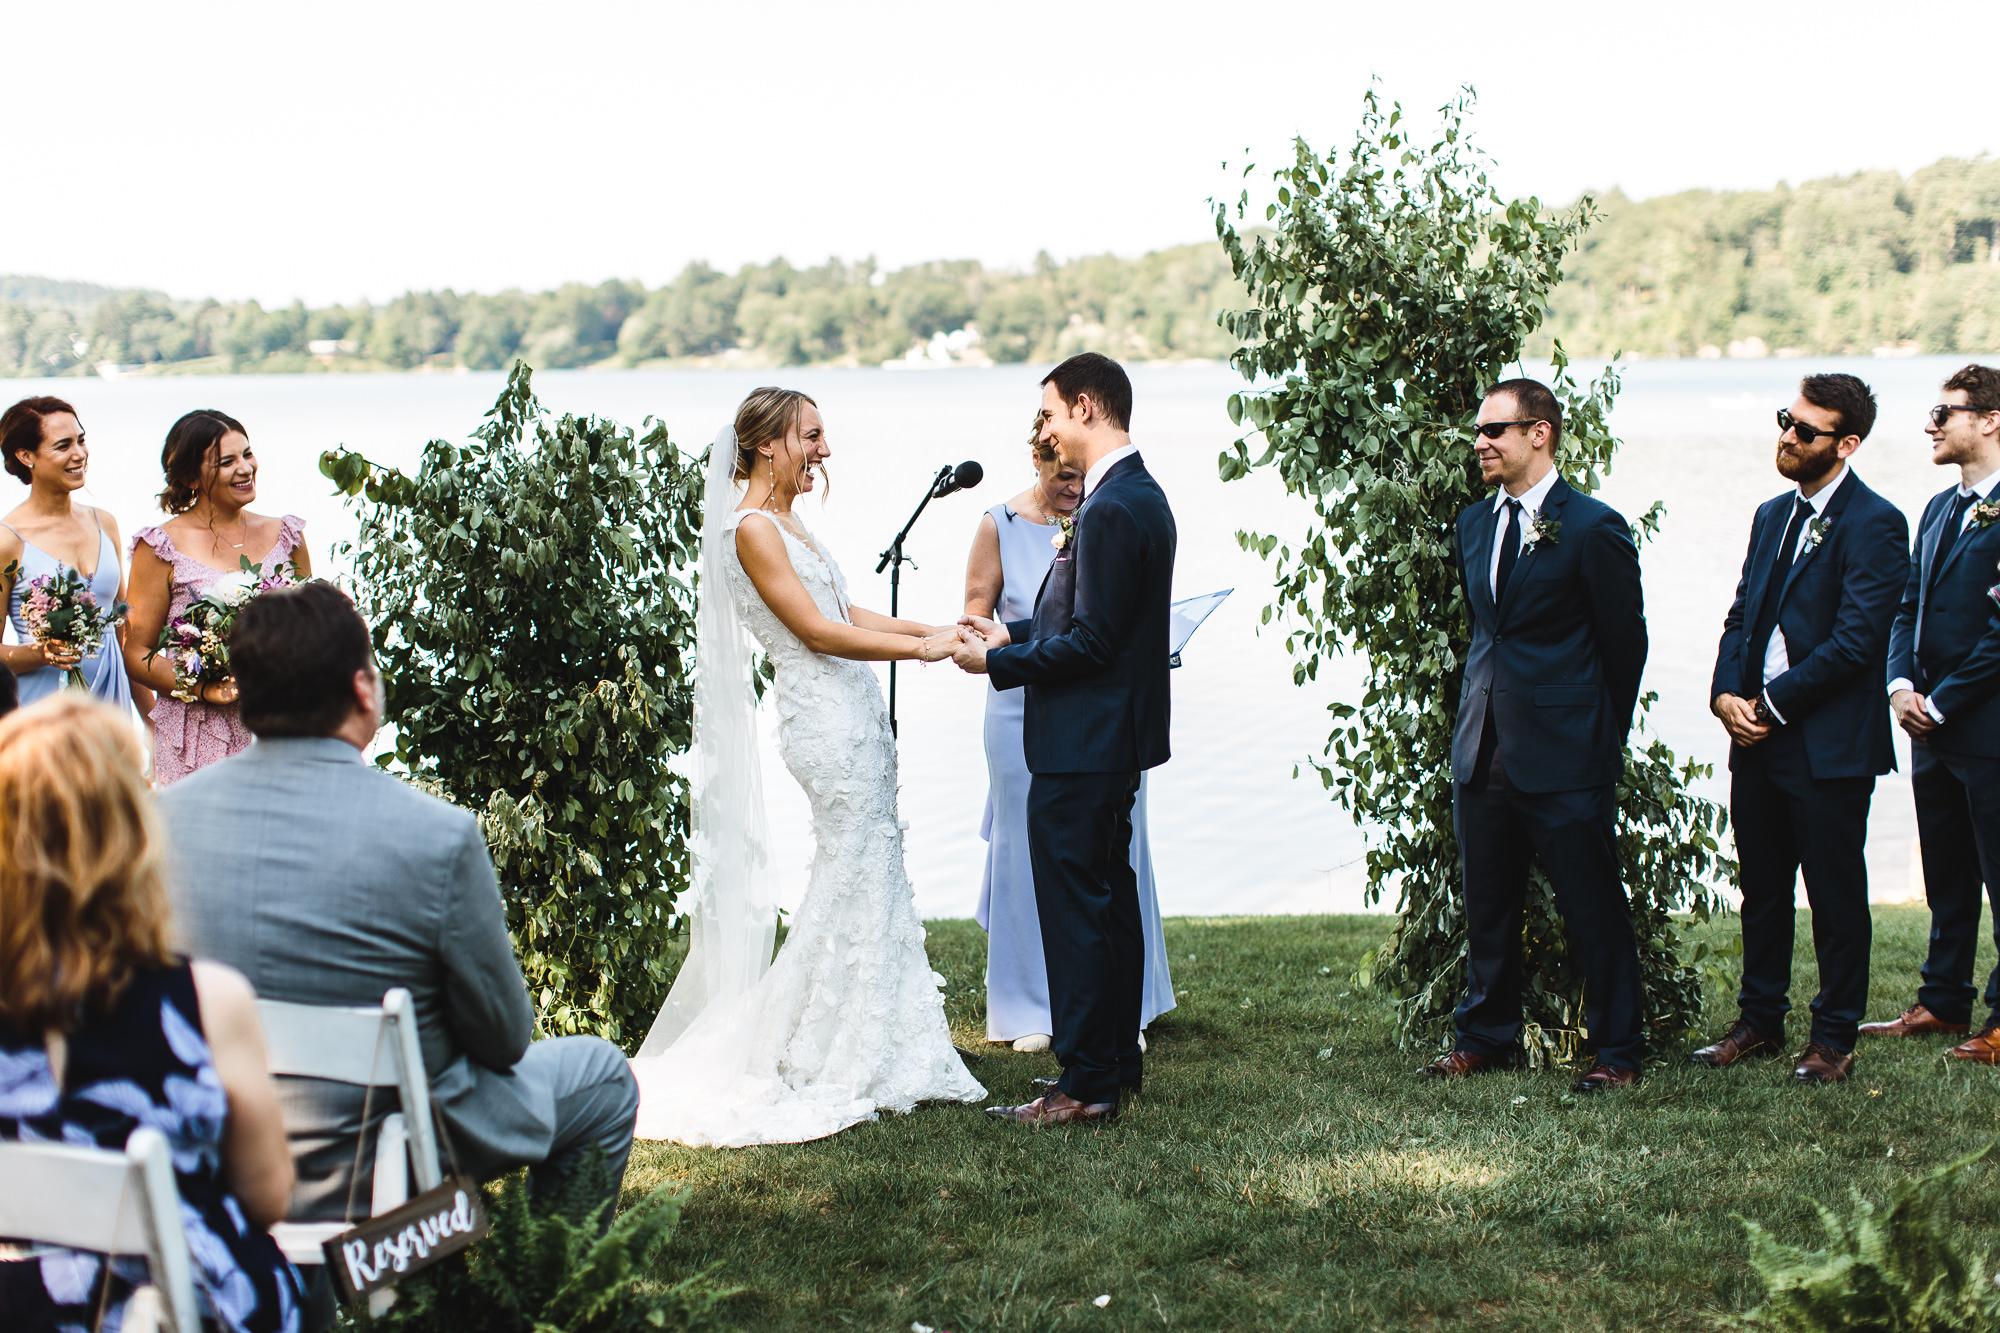 connecticut-summer-lake-wedding-emily-kirke-photography-upstyle (94 of 181).jpg